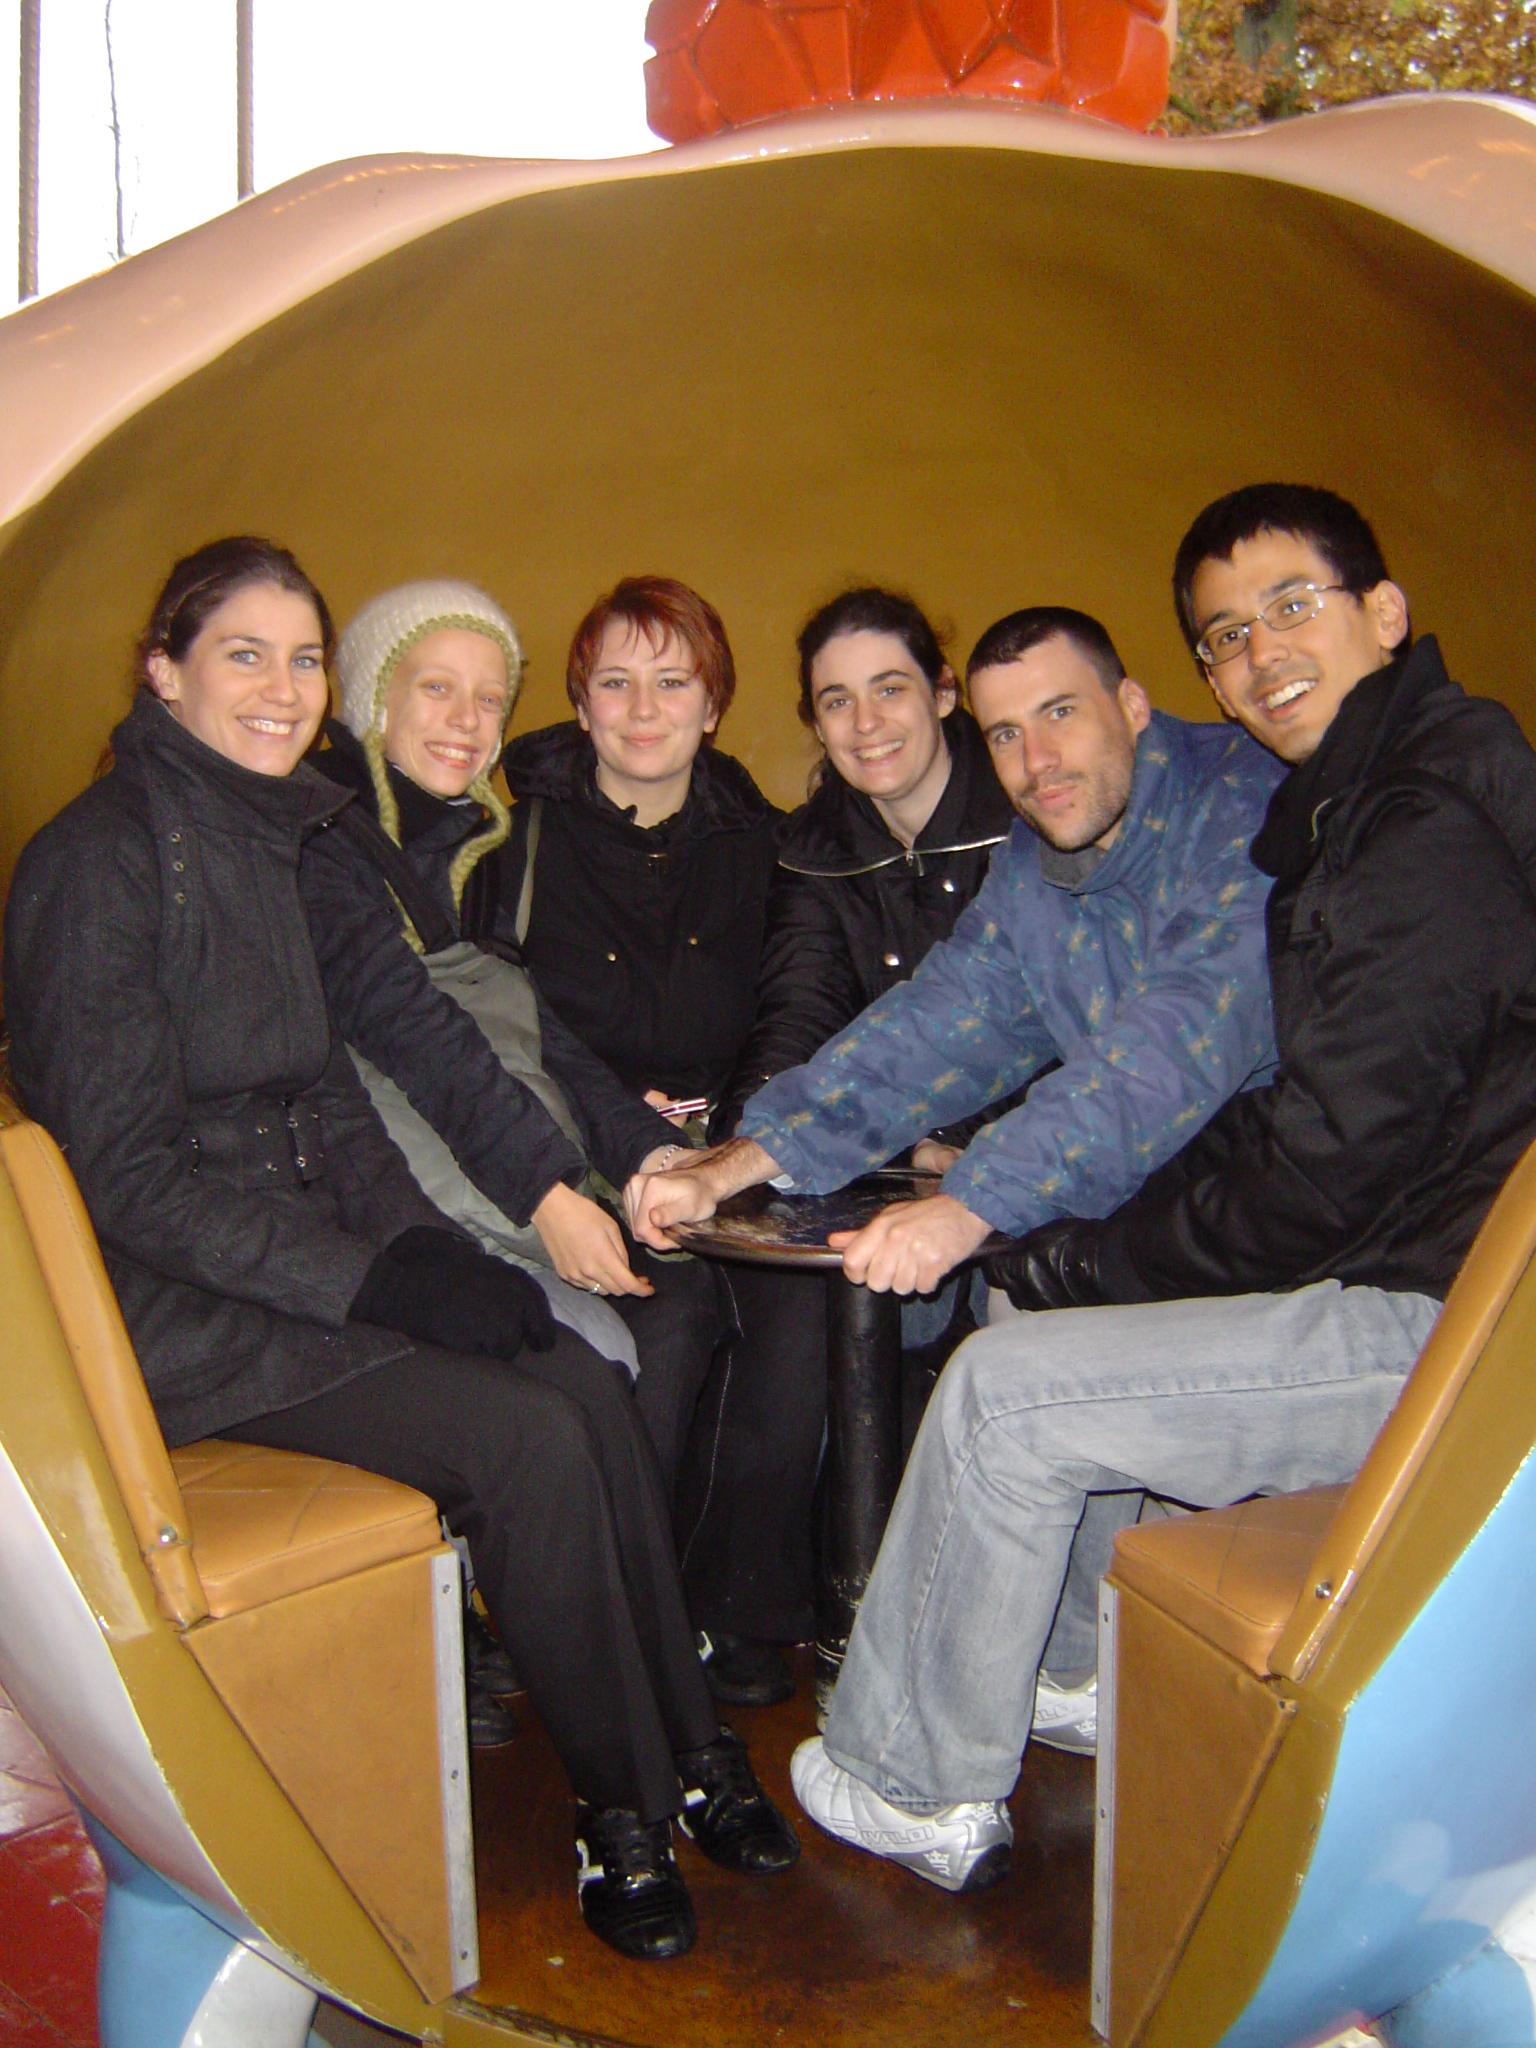 Photo 45 - Obélix en a plein le dos! (Camie, Mara_Jade, AngeSolo, Kenda, Joruus29, Fixer)